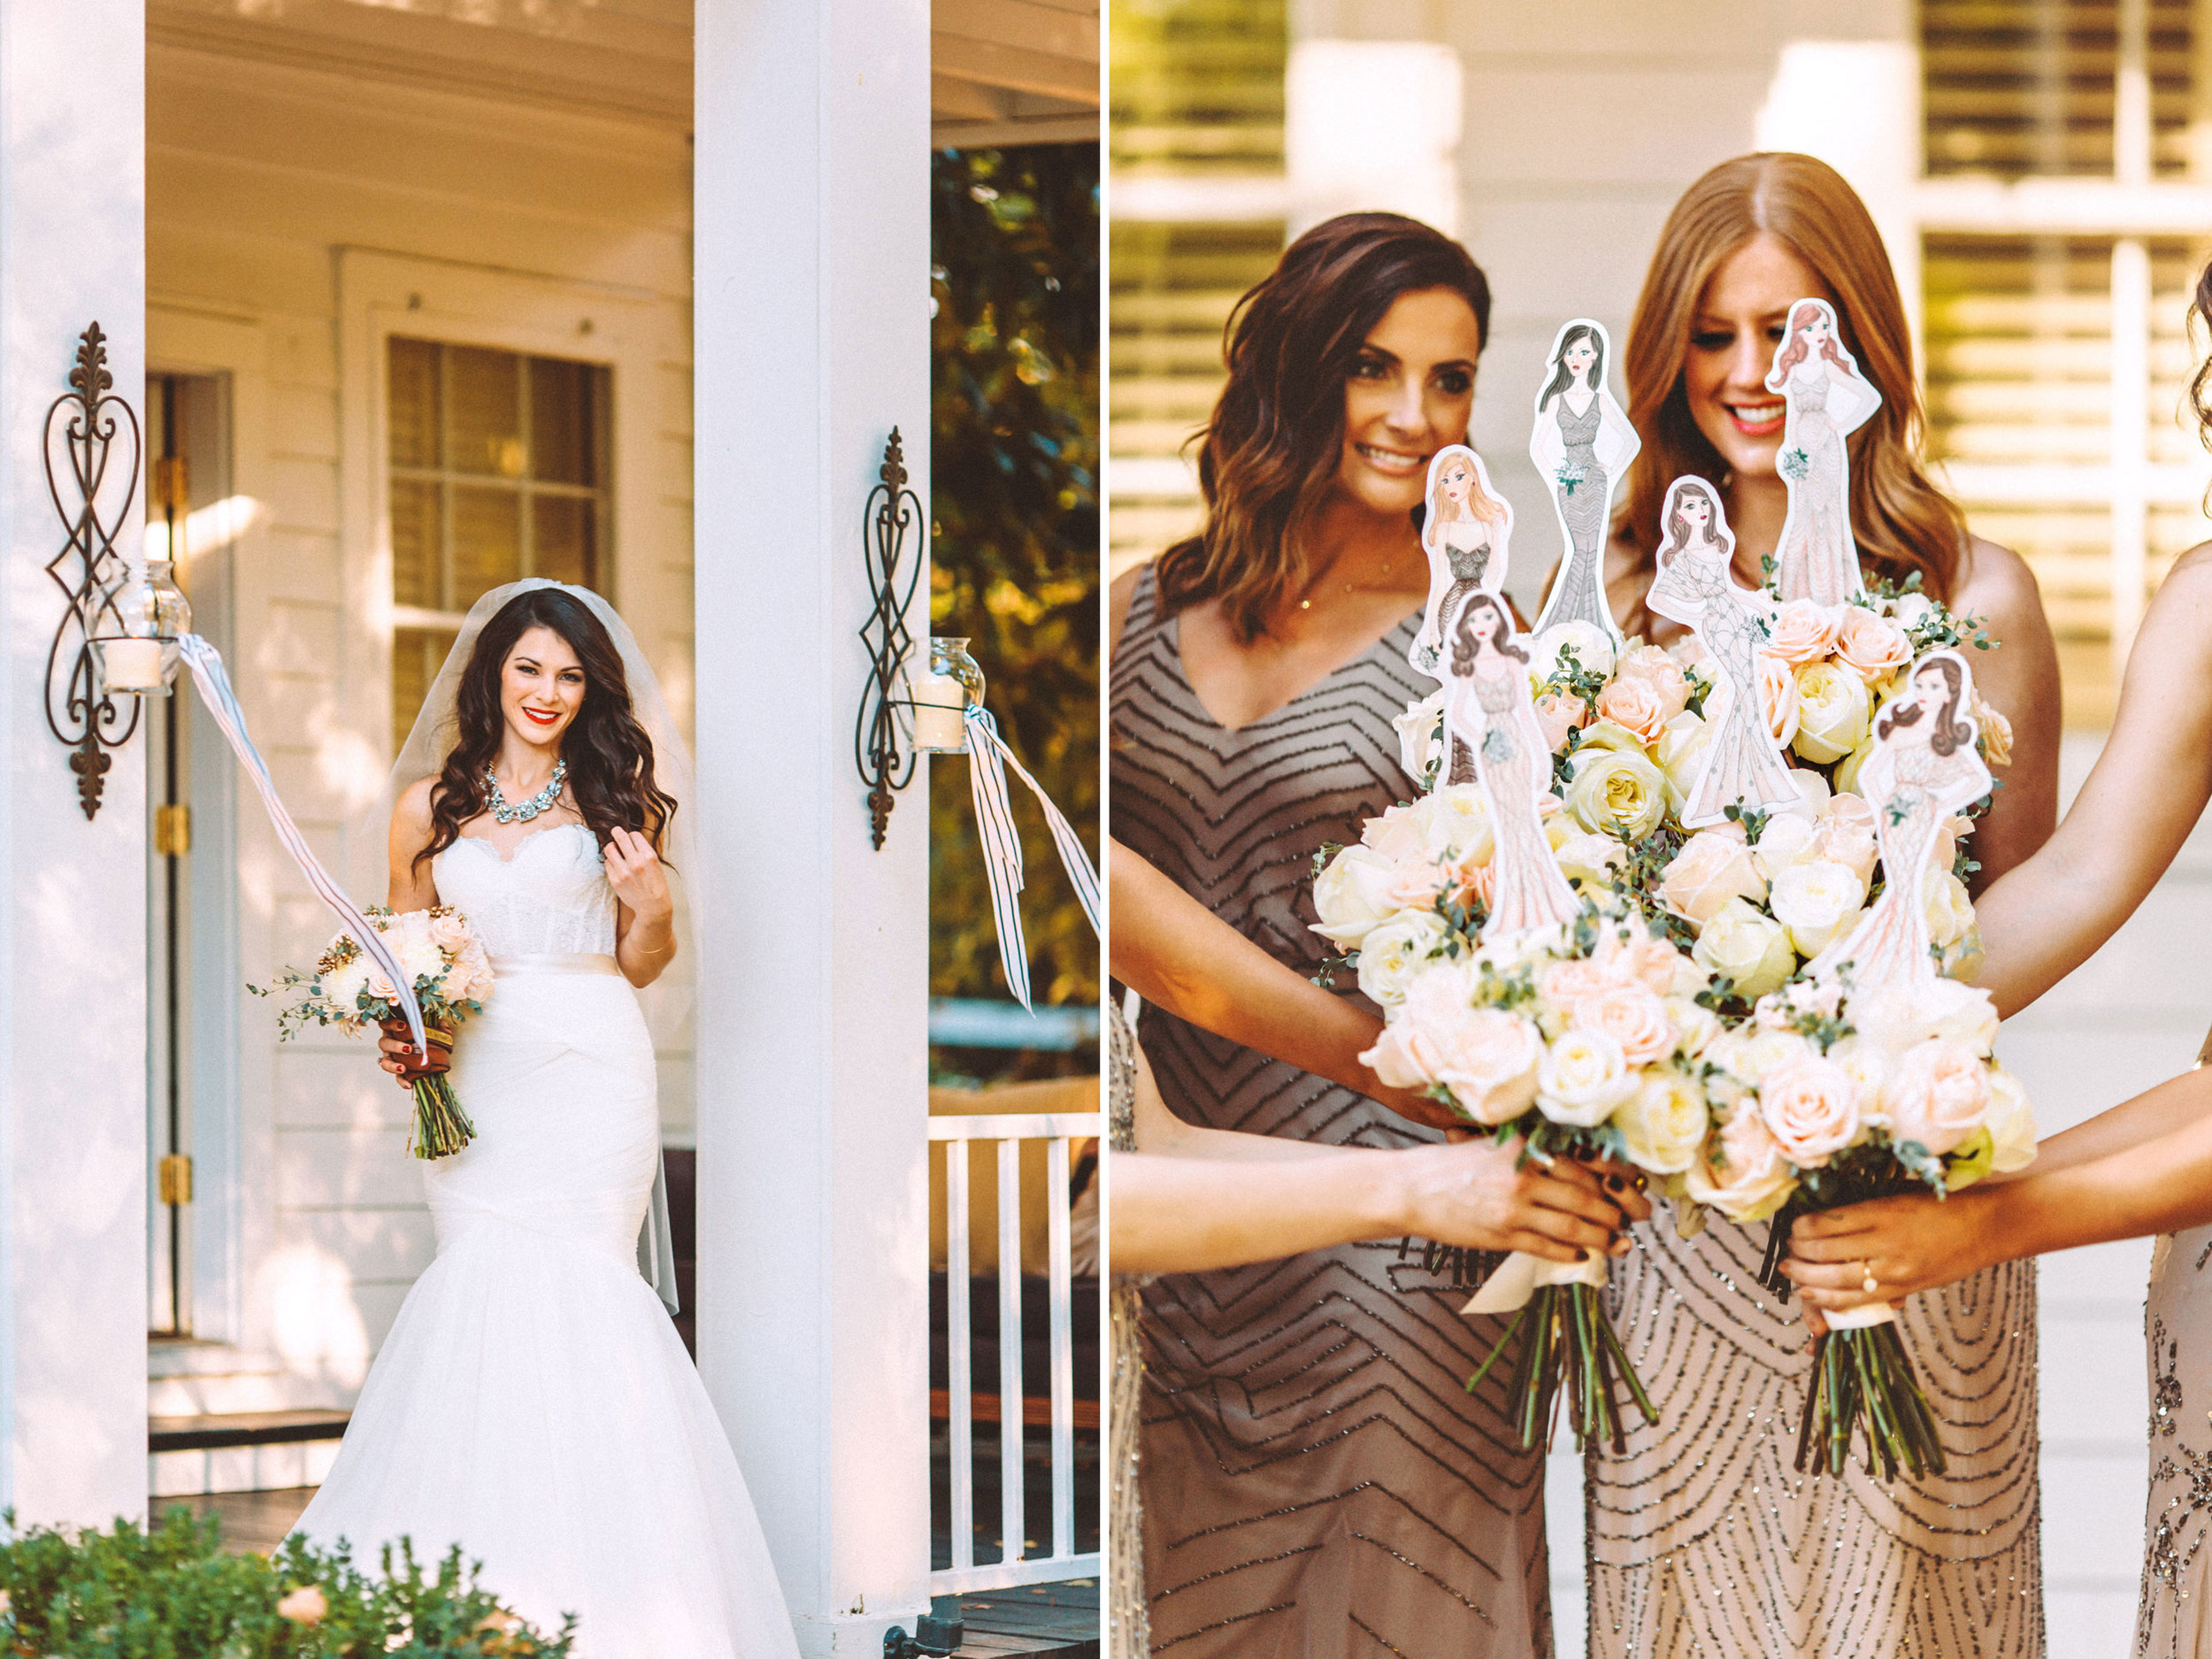 Me & Mr. Jones Wedding, Watters Carina Corset, Watters Amina Skirt, Historic Cedarwood in Nashville, Fashion Illustrations of Bridesmaids